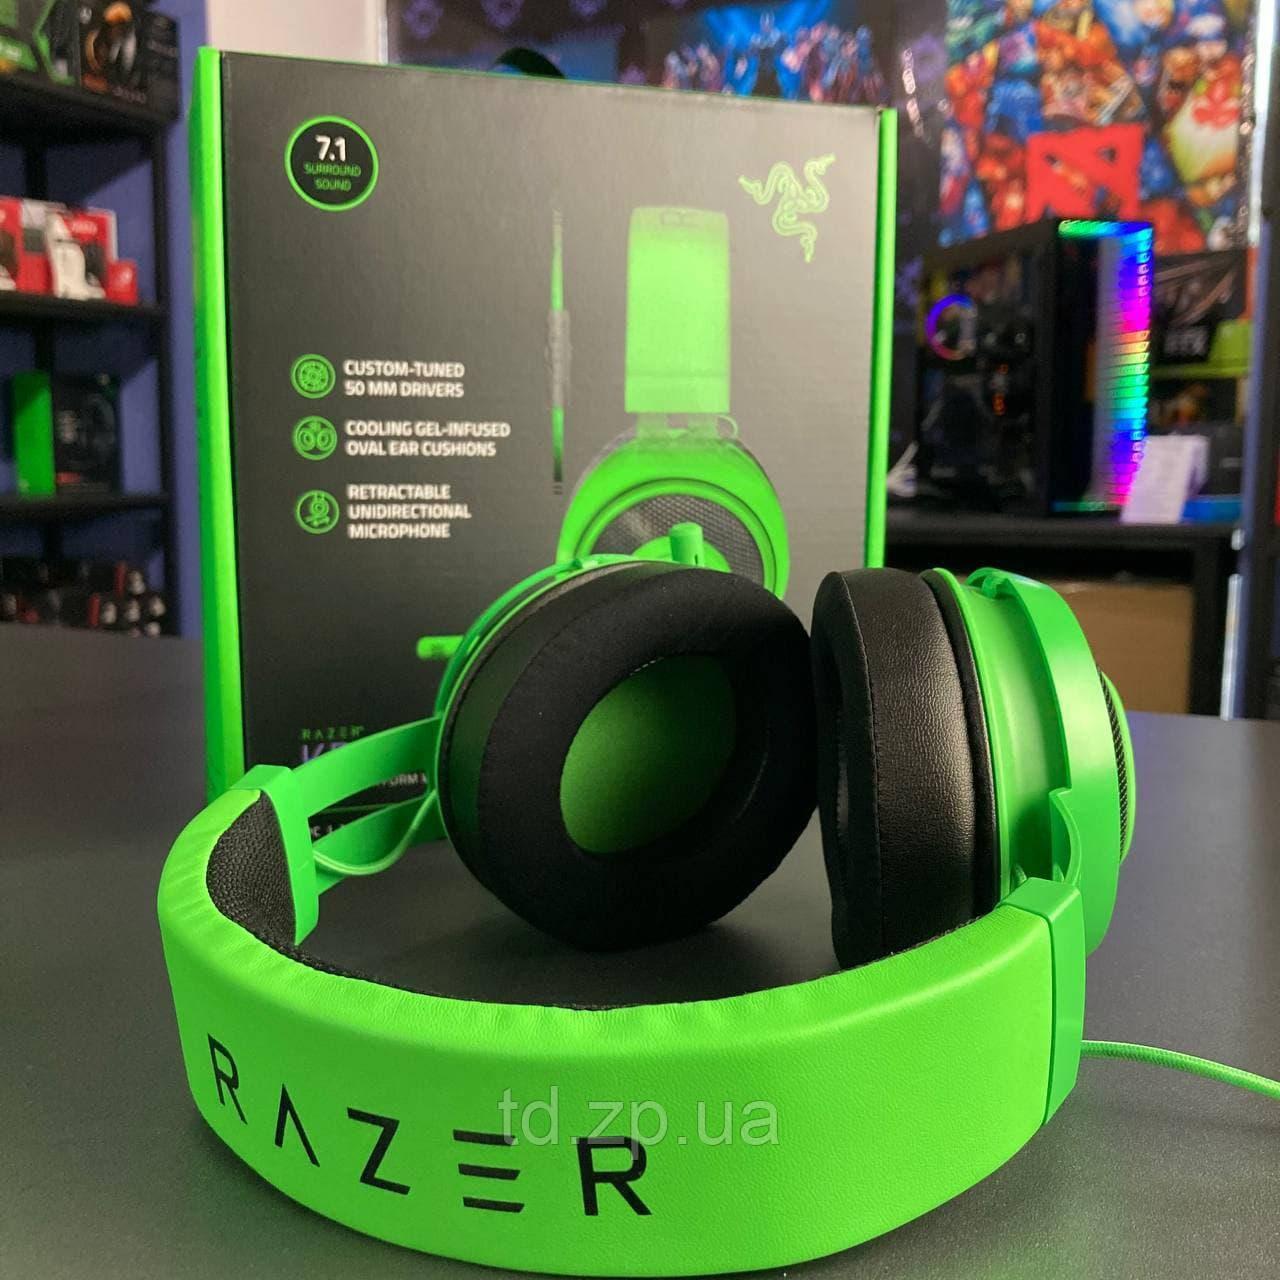 Наушники Razer Kraken Green